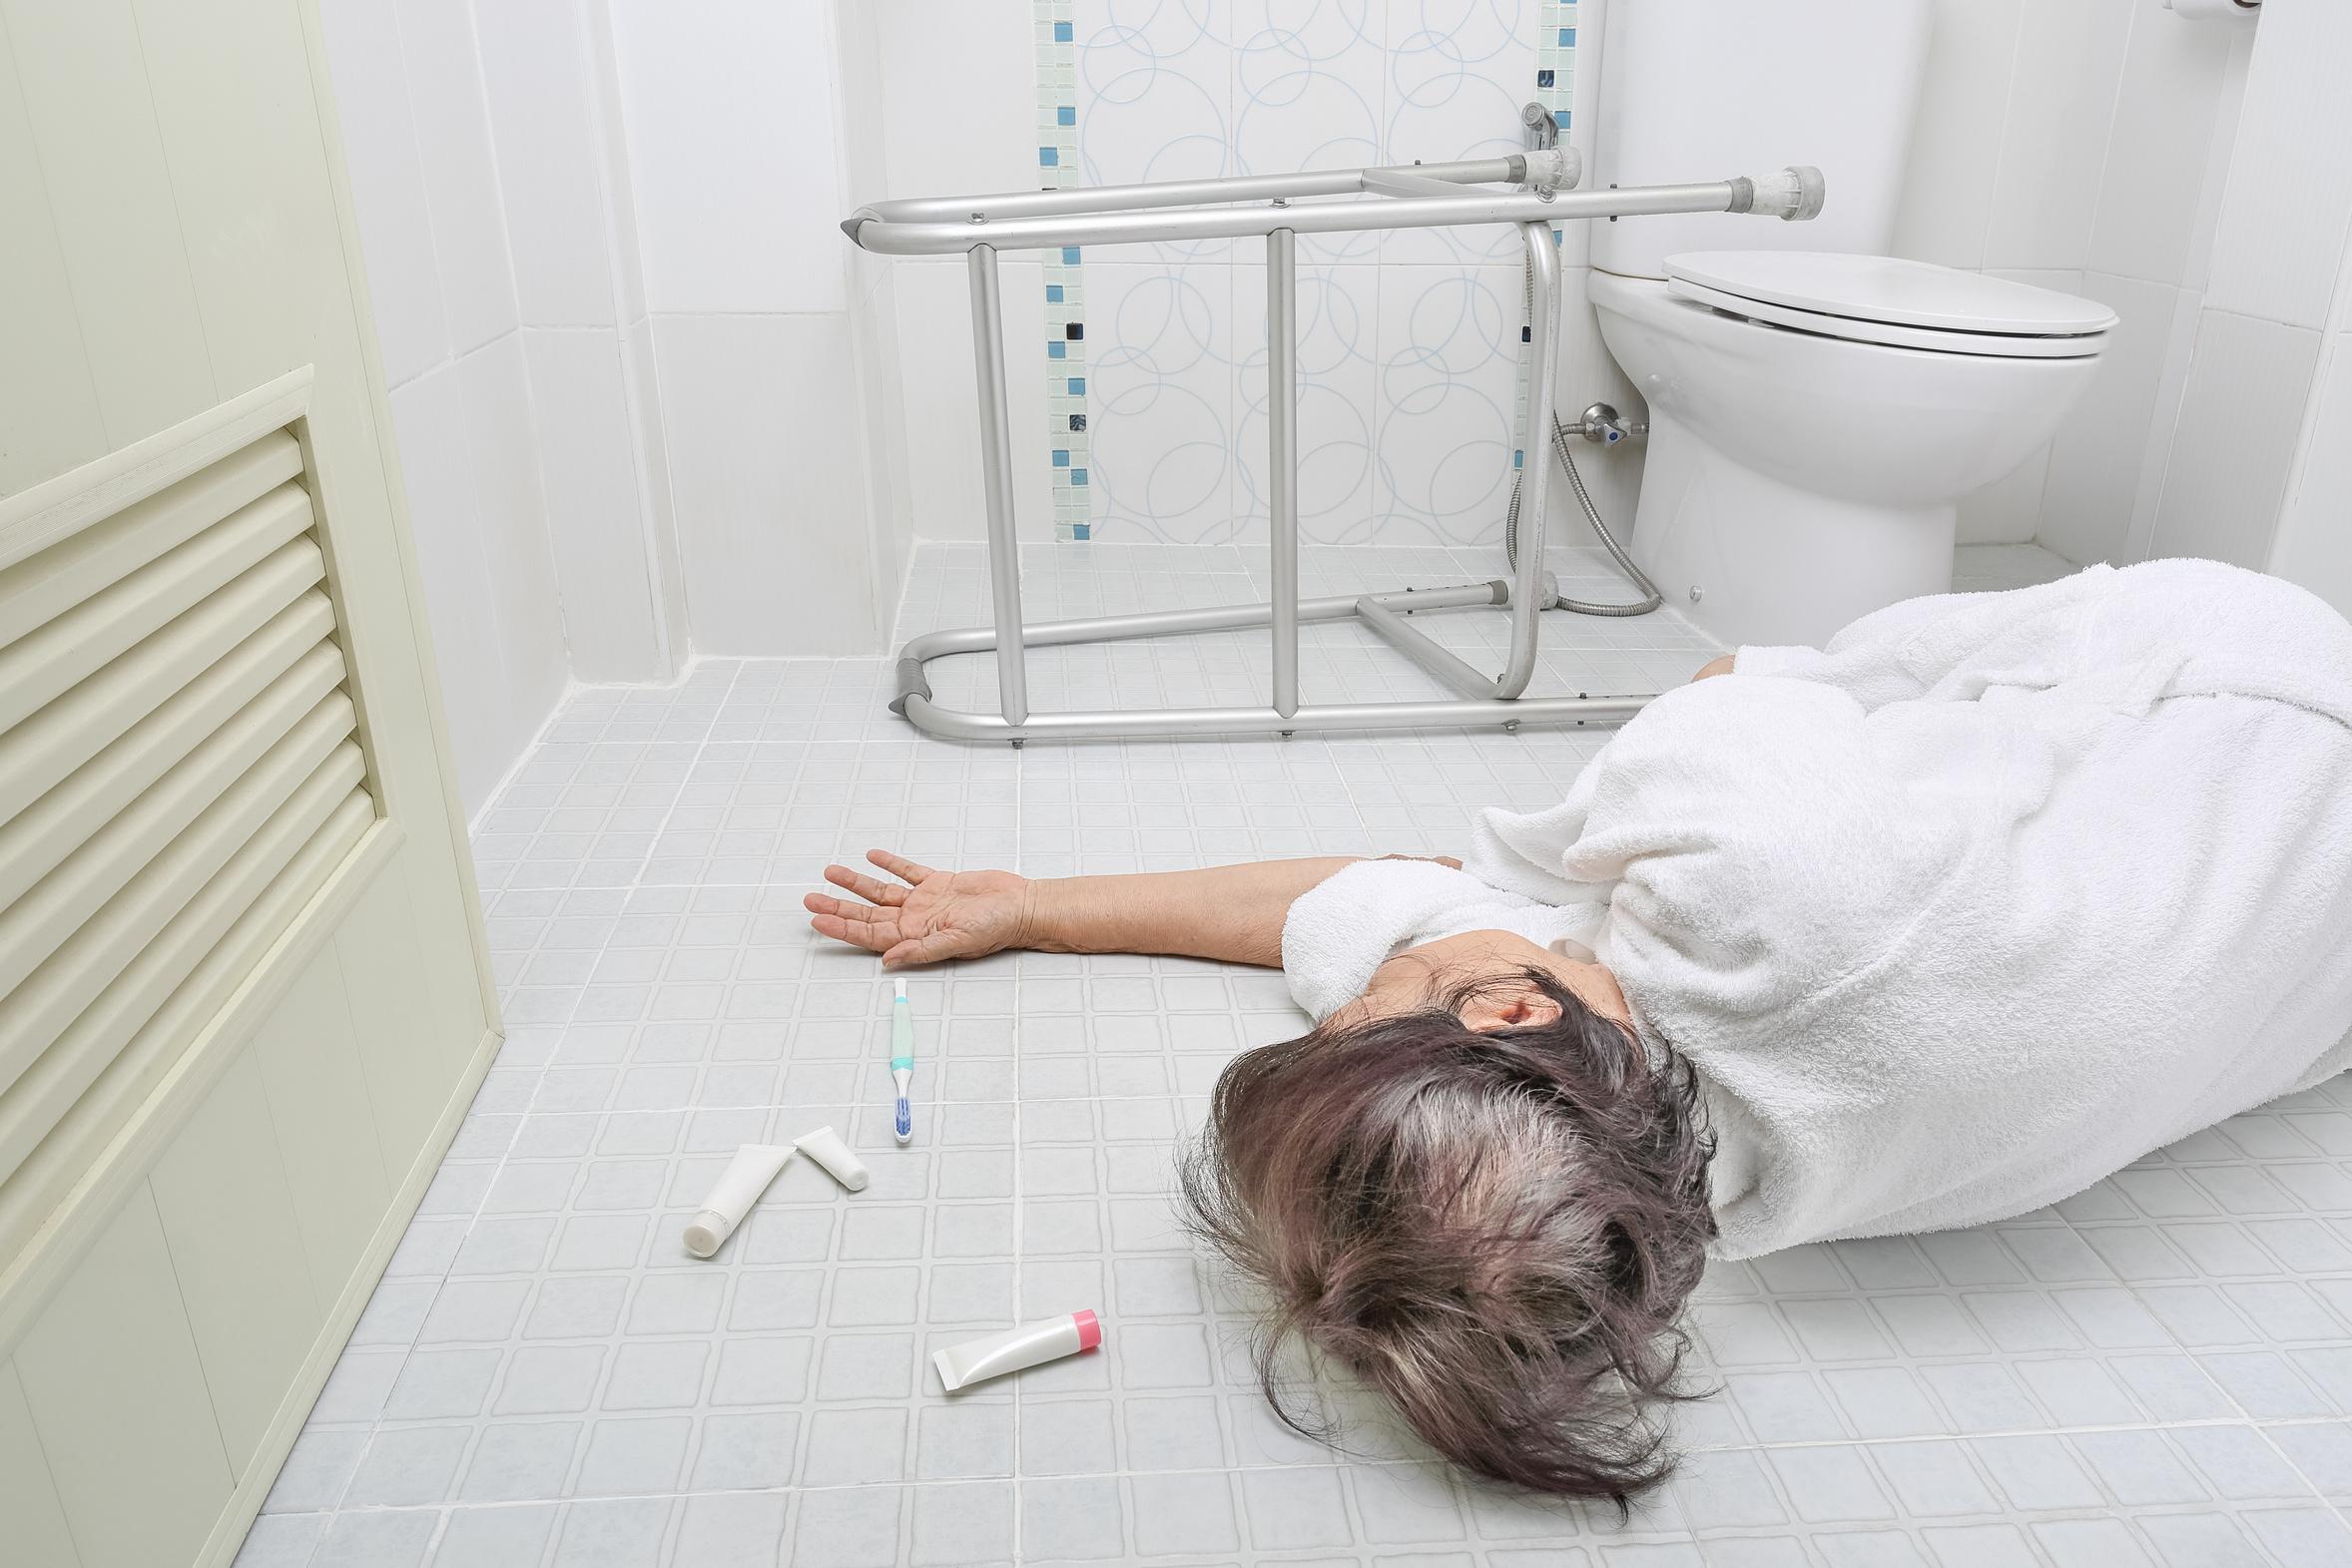 Seniorin liegt bewusstlos im Badezimmer